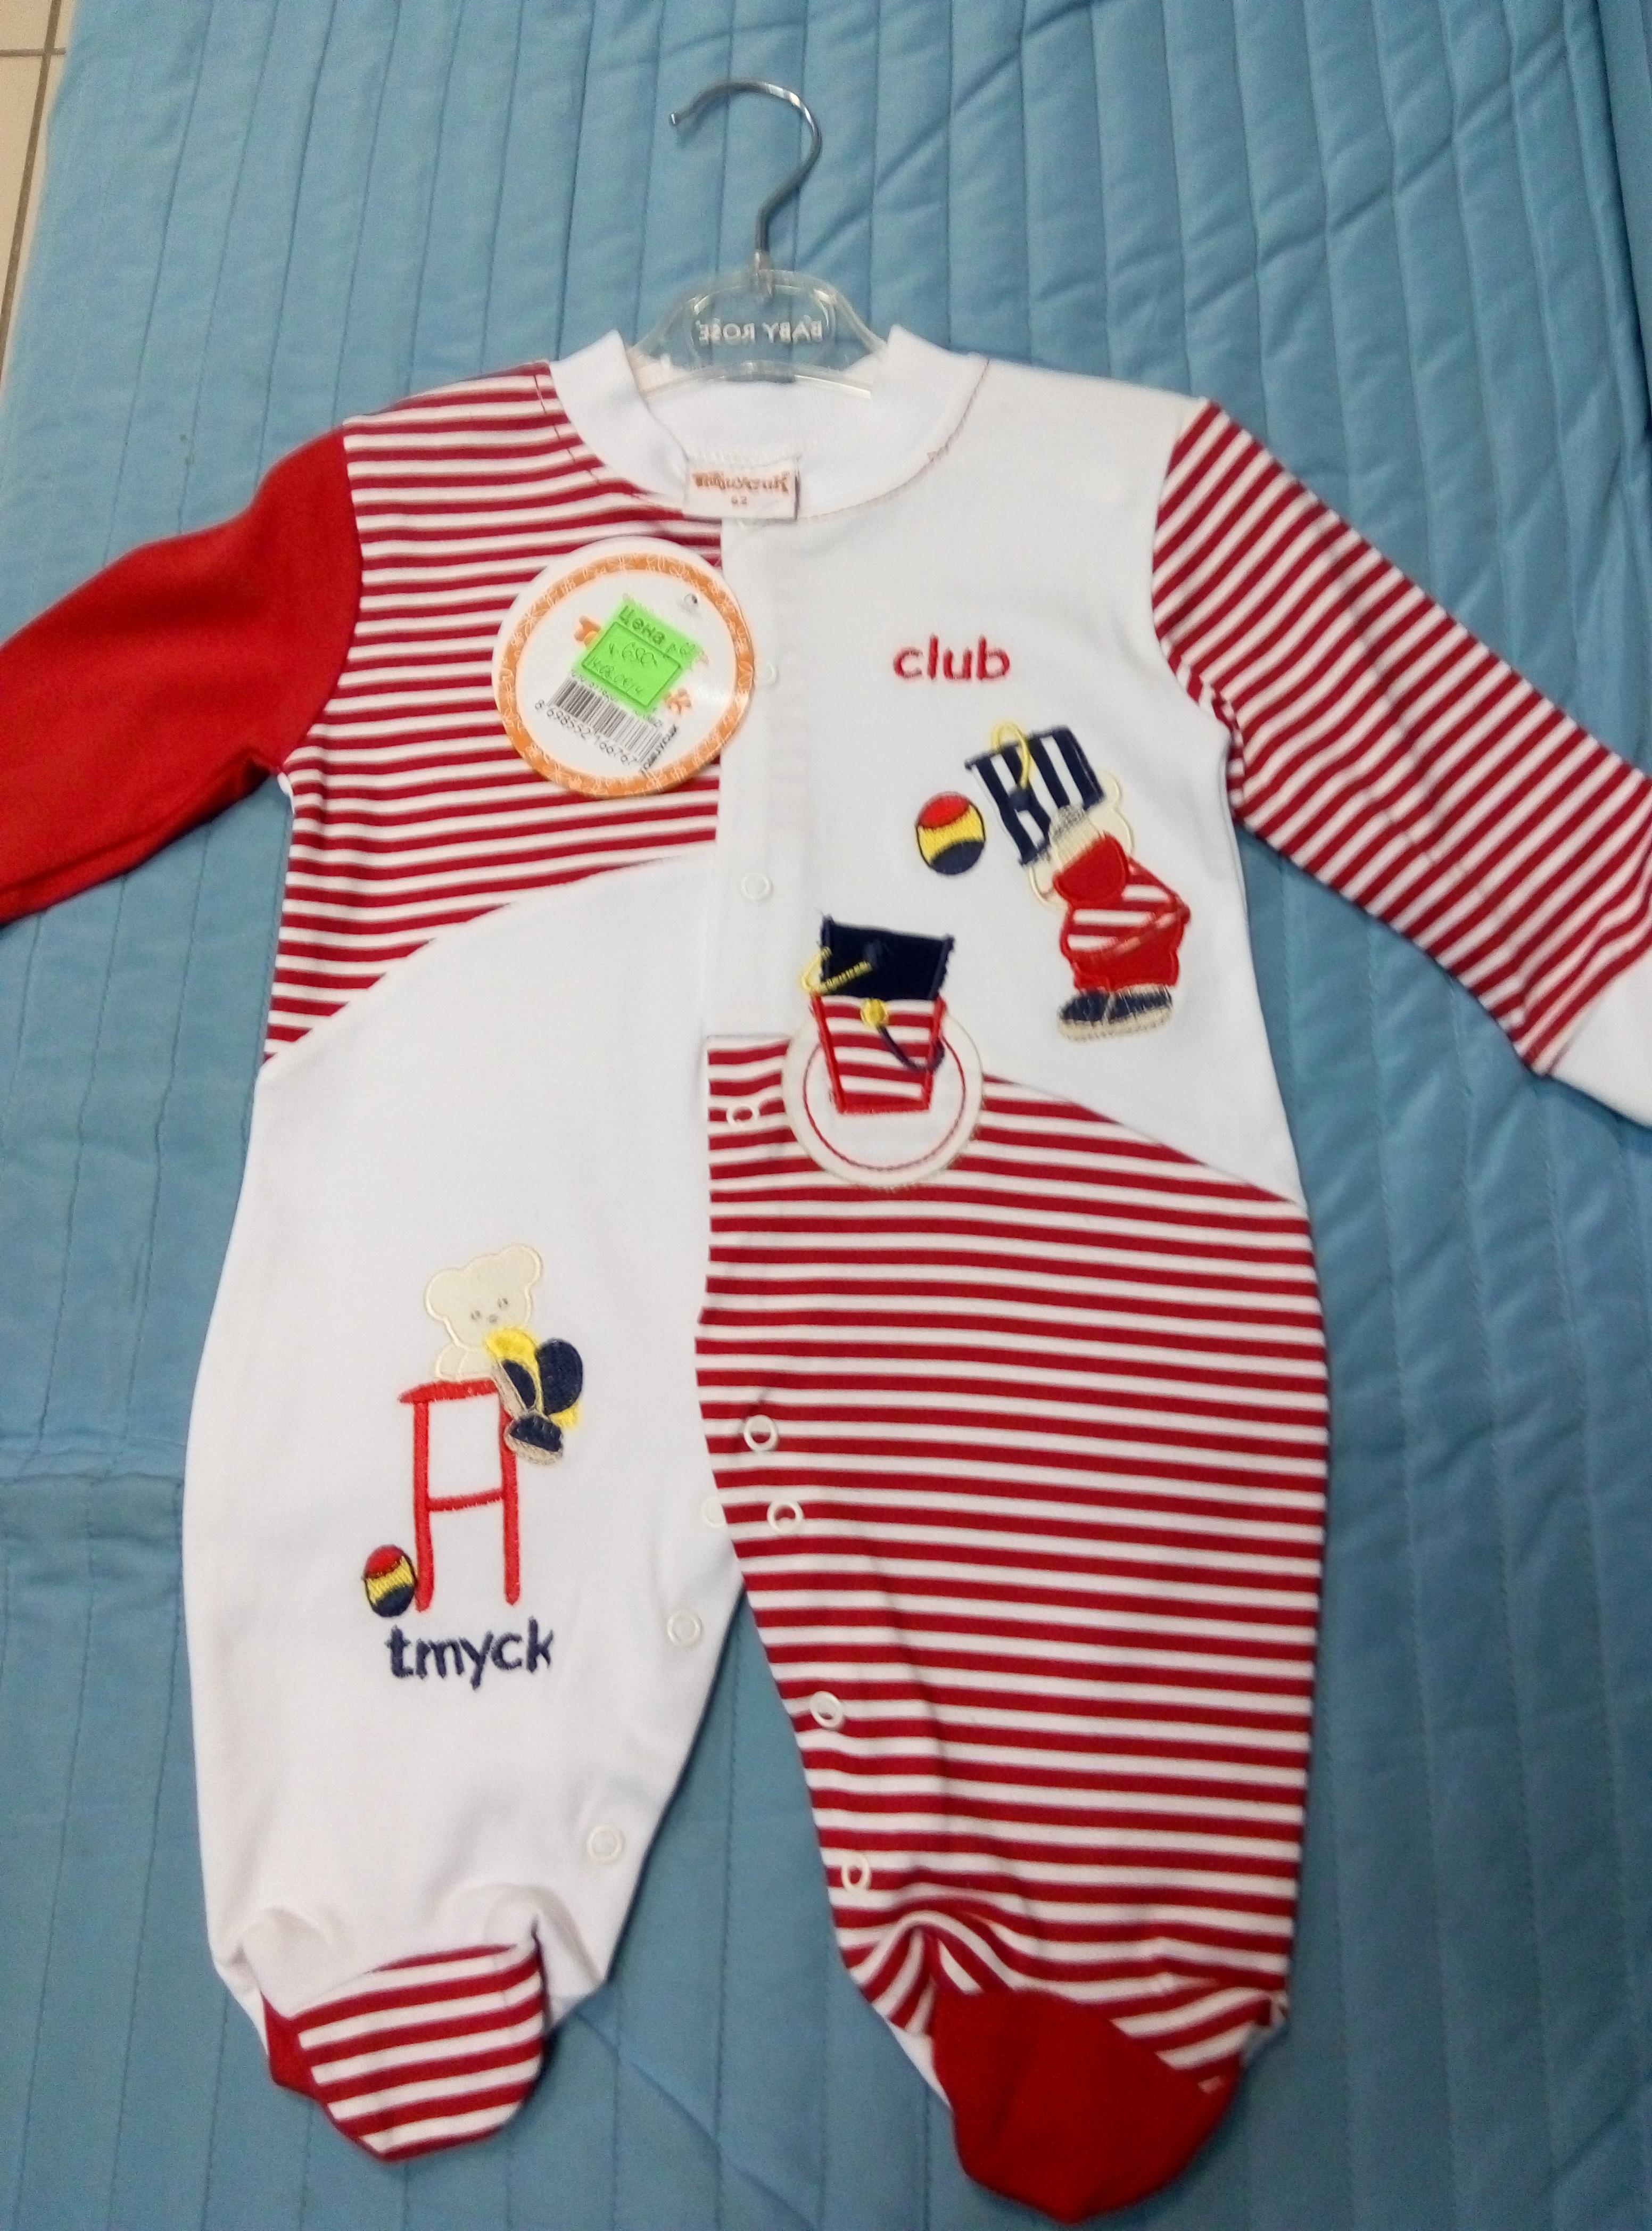 Комбинезон Х/Б  Цвет: белый с красным. Размер:56,62. Цена:750р. производ. Турция.